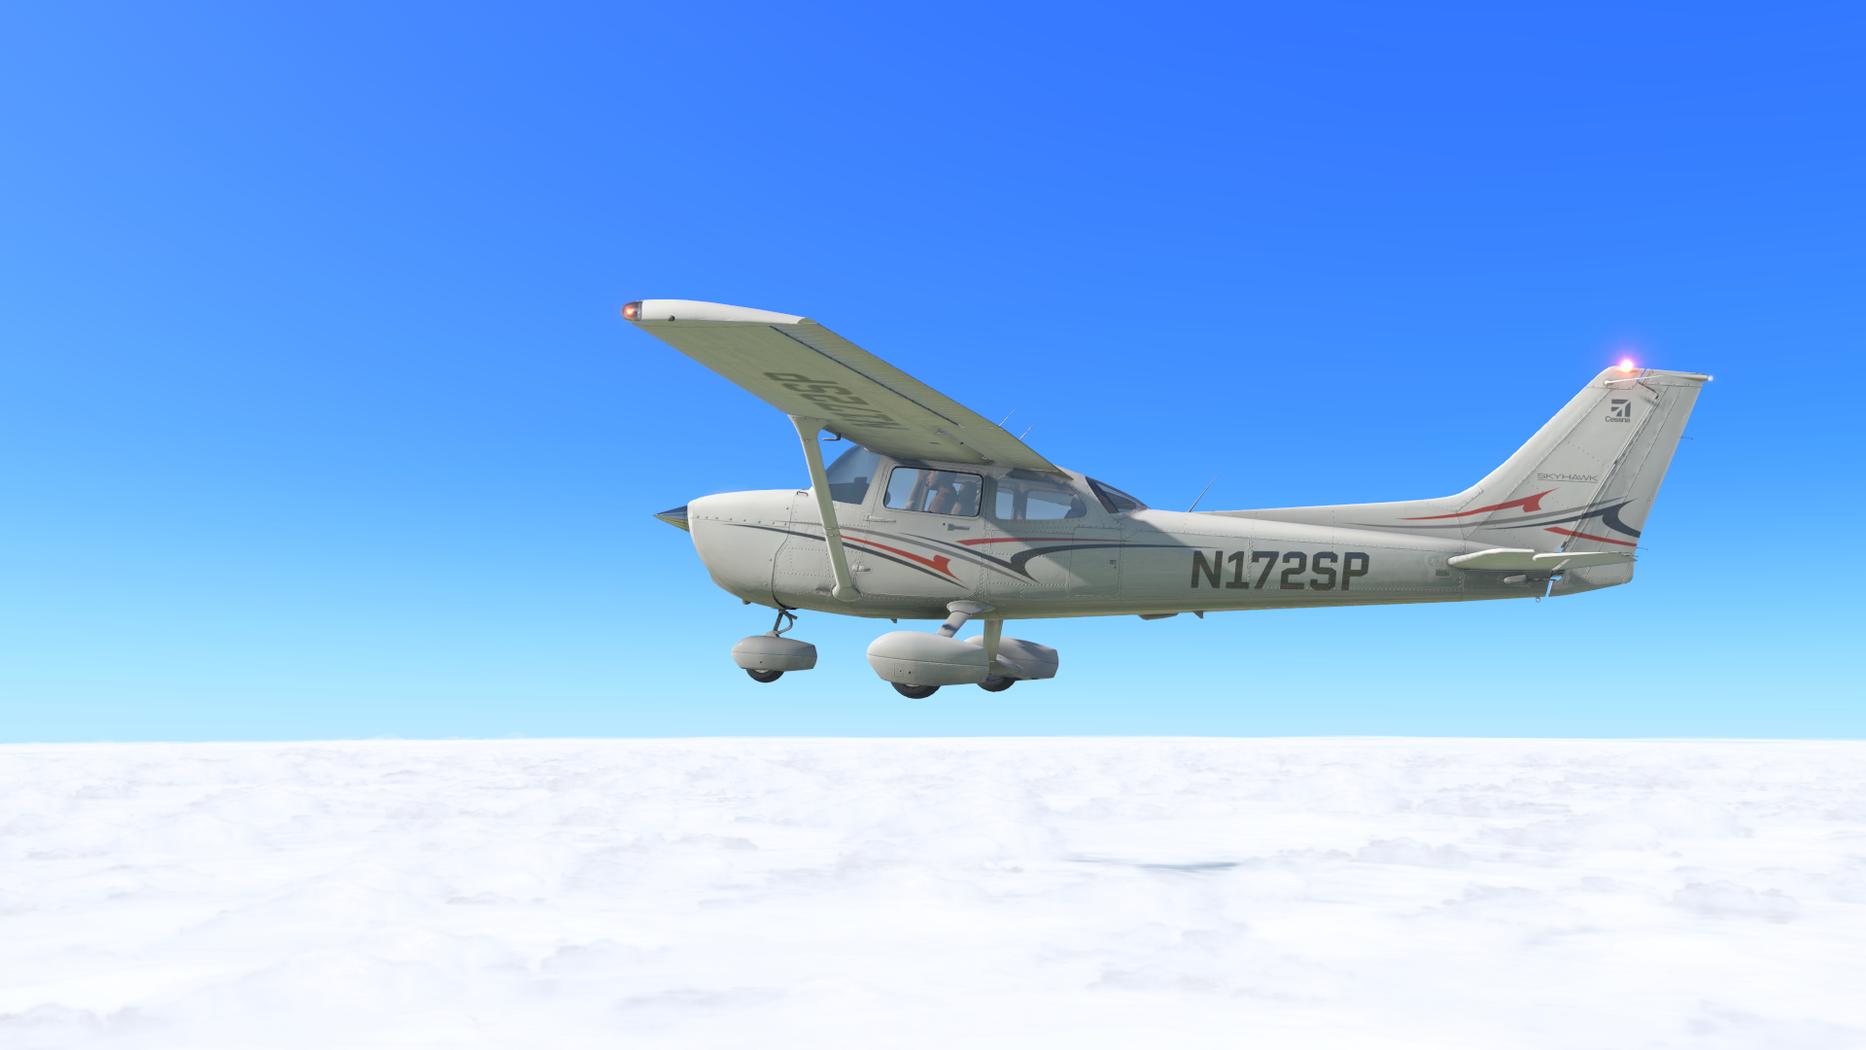 1644552393_Cessna_172SP-2019-04-1401_32_46.thumb.png.ec4f6848f62bfc31e18cd2ea0ee8d861.png